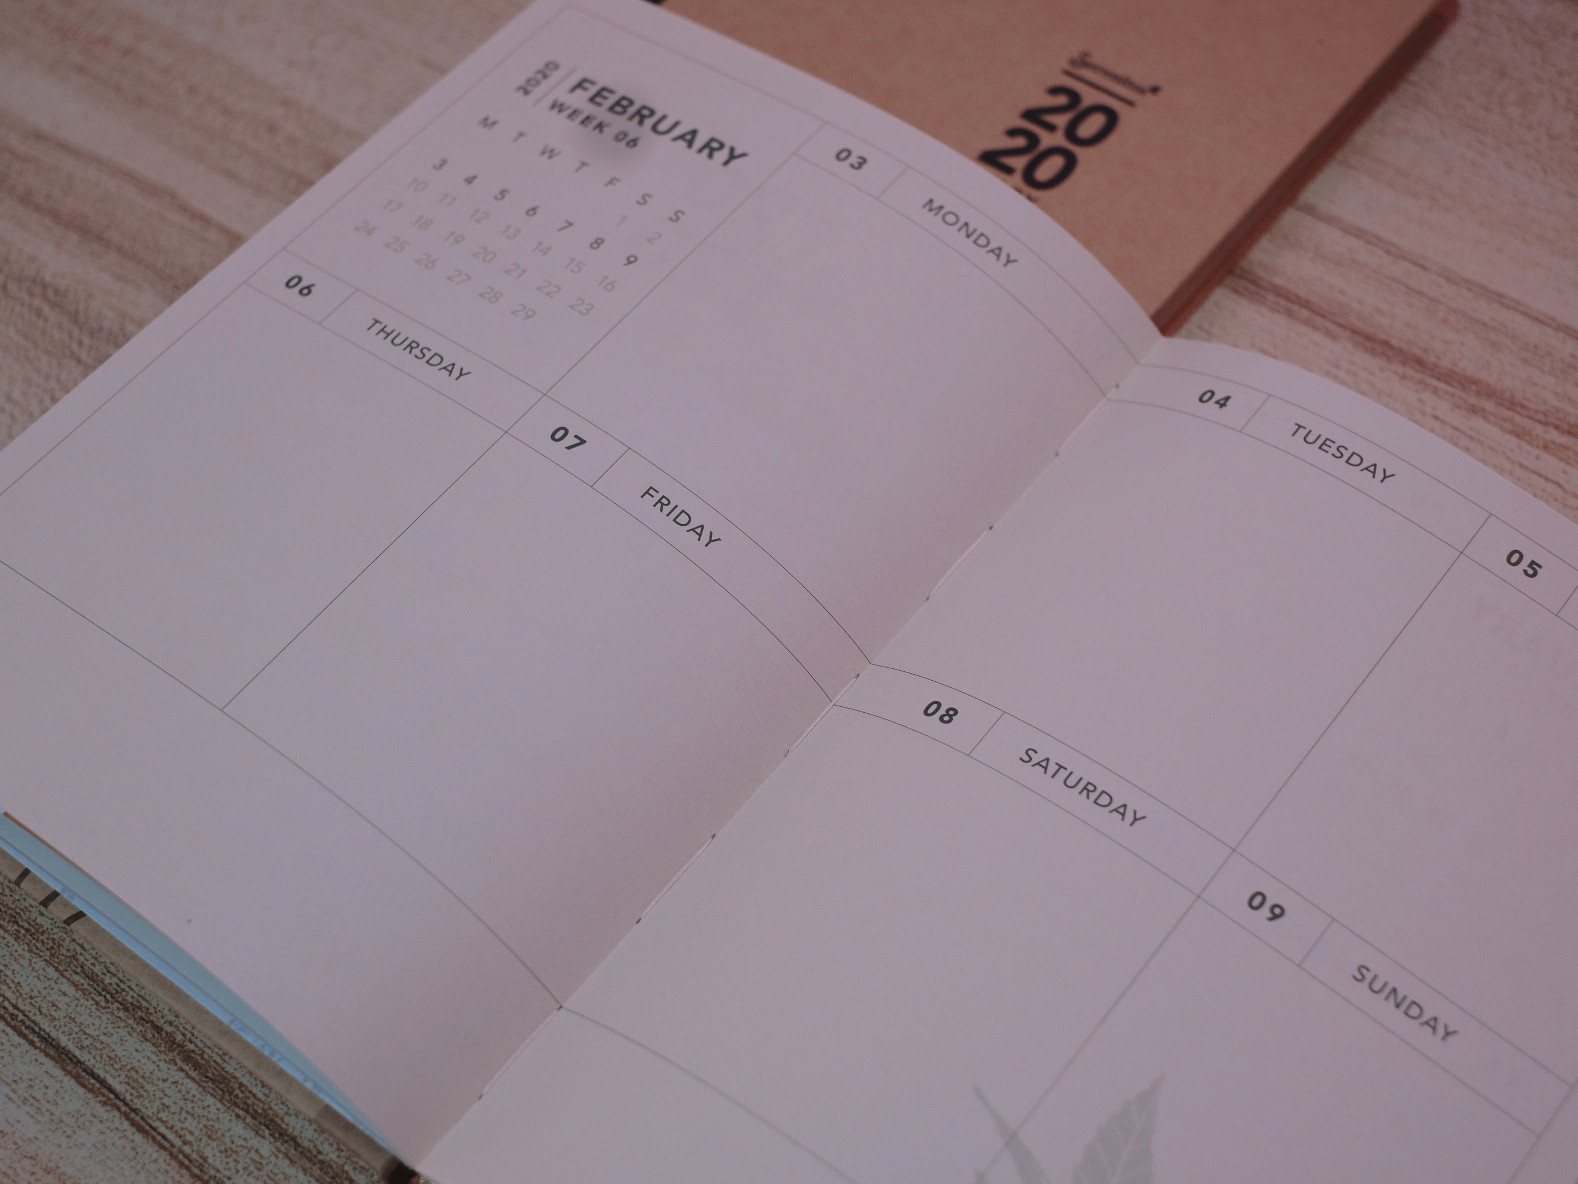 Serenitea Holiday Drinks + Get a FREE Serenitea 2020 Diary